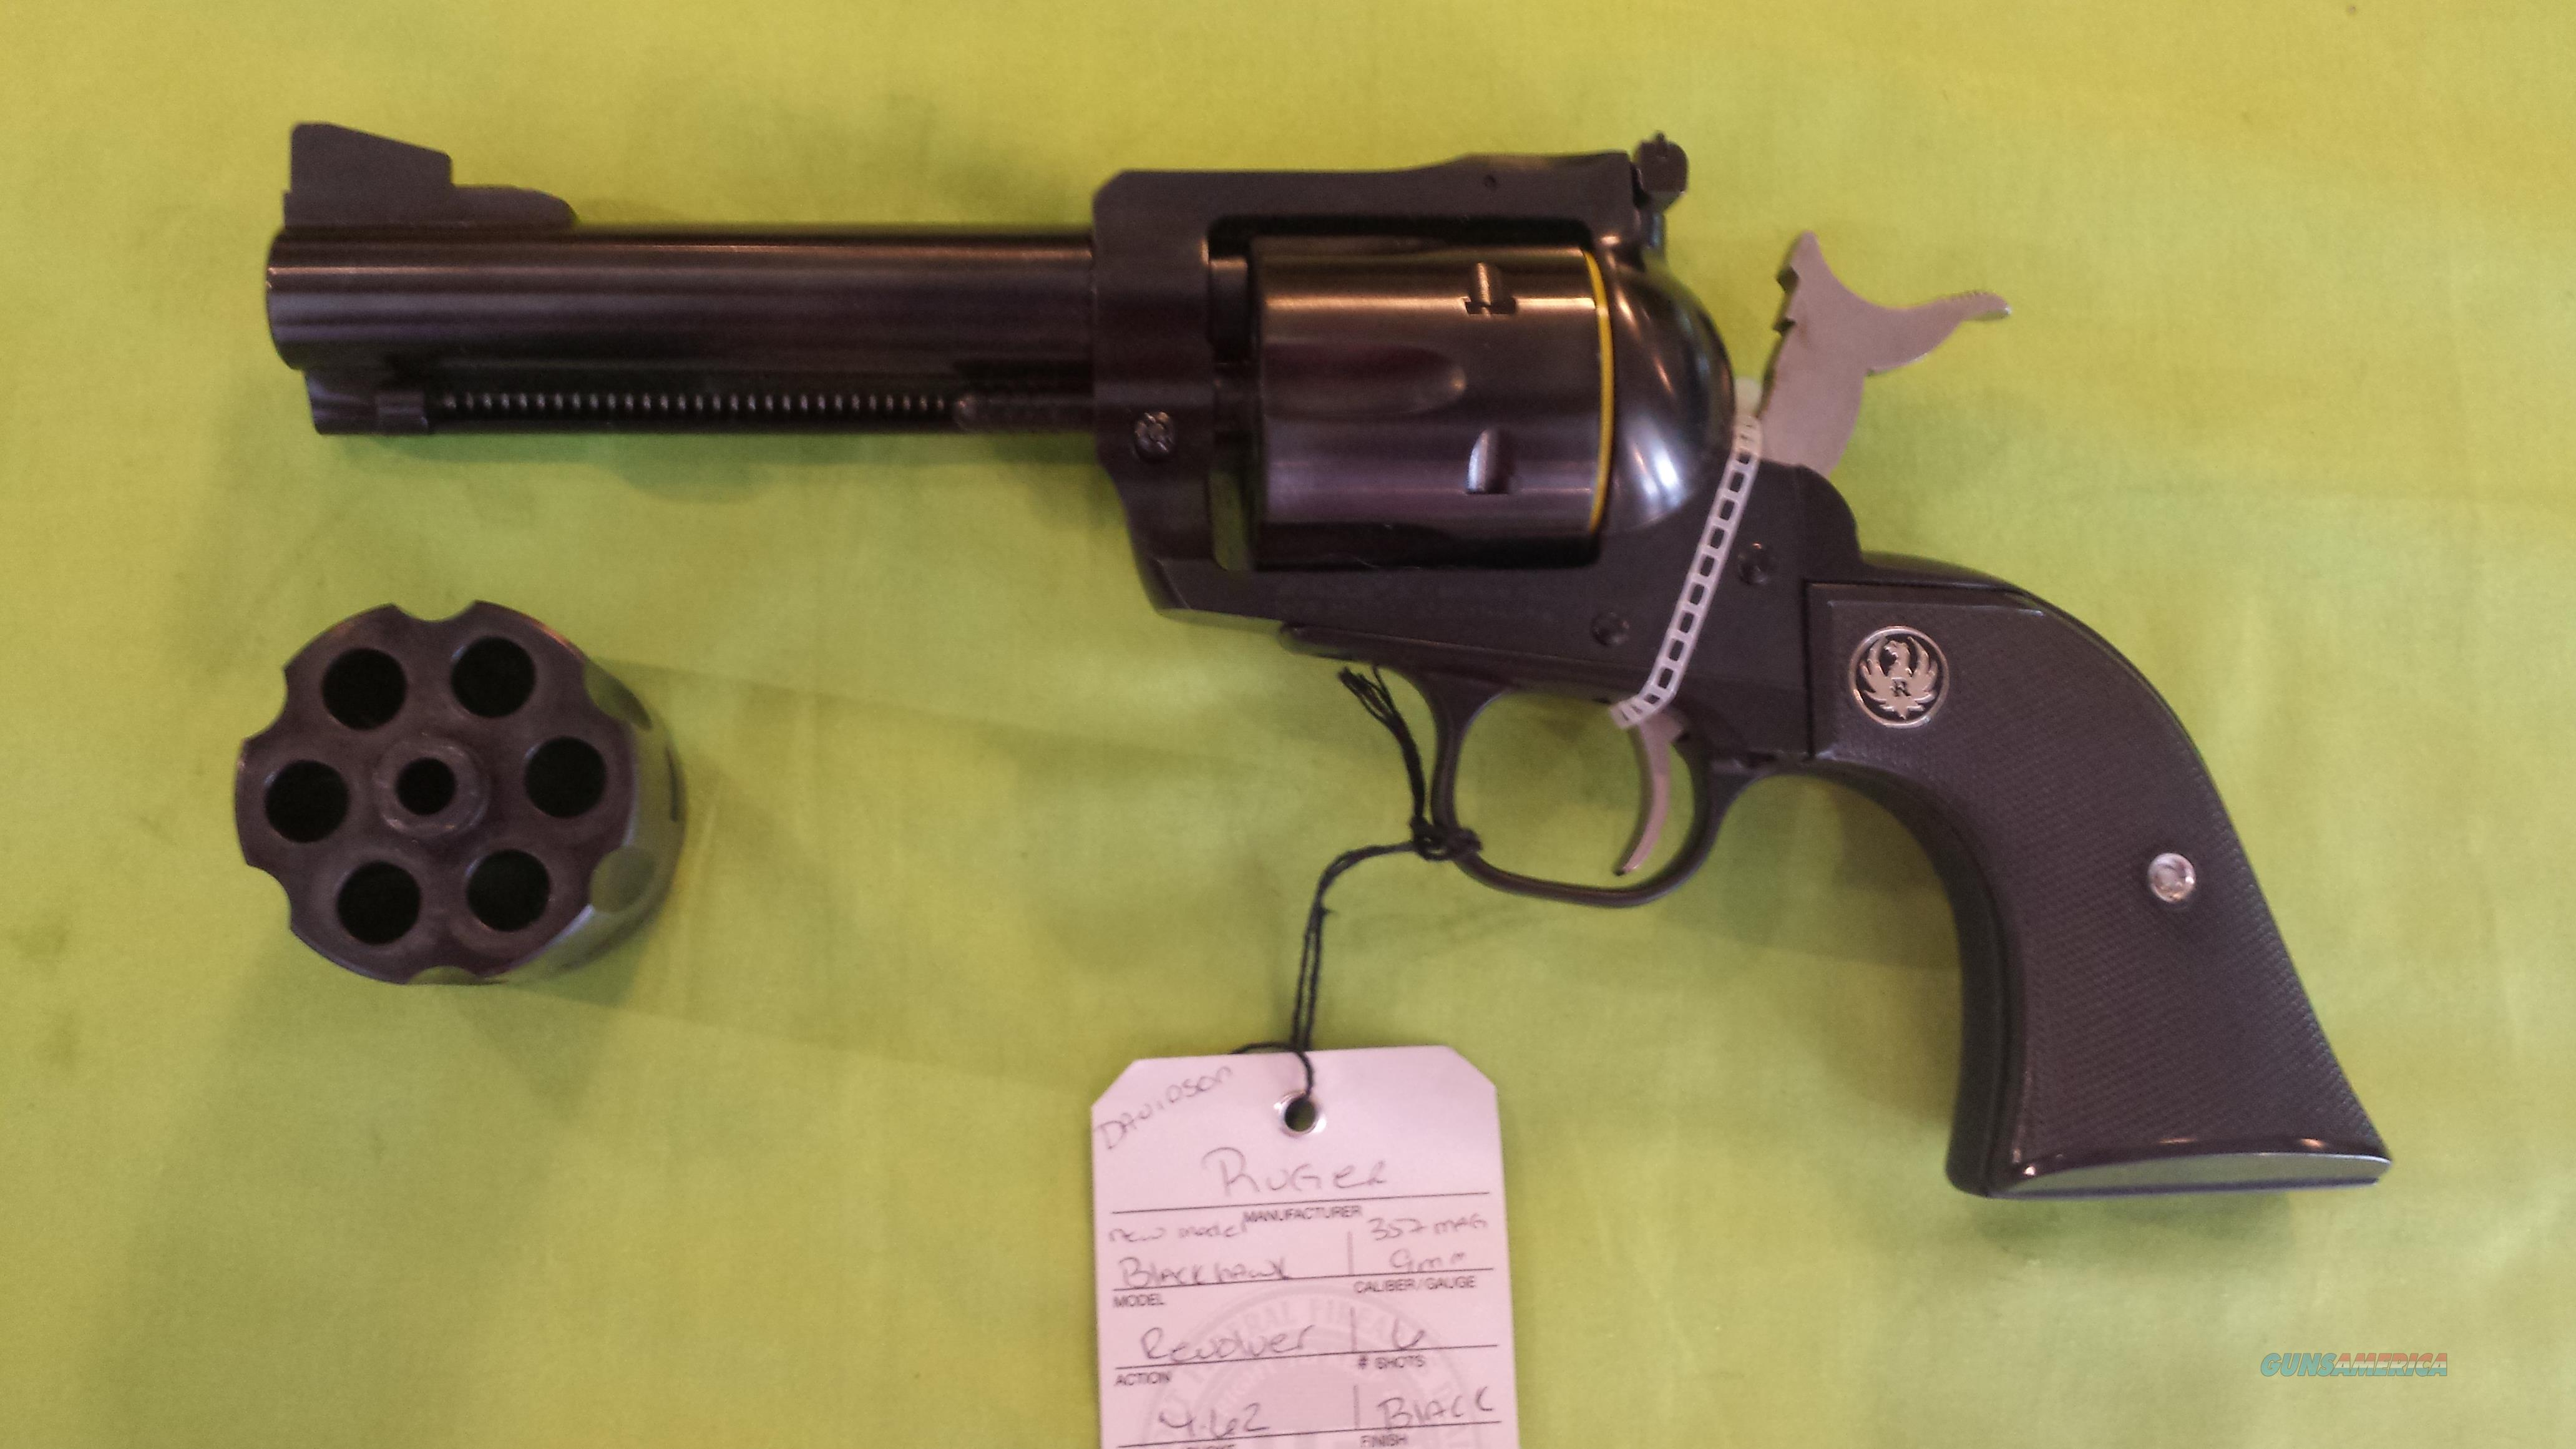 RUGER BLAKHAWK 357 MAG 9 MM 4.62 (2) CYLINDER CONVERTIBLE 0308   Guns > Pistols > Ruger Single Action Revolvers > Blackhawk Type